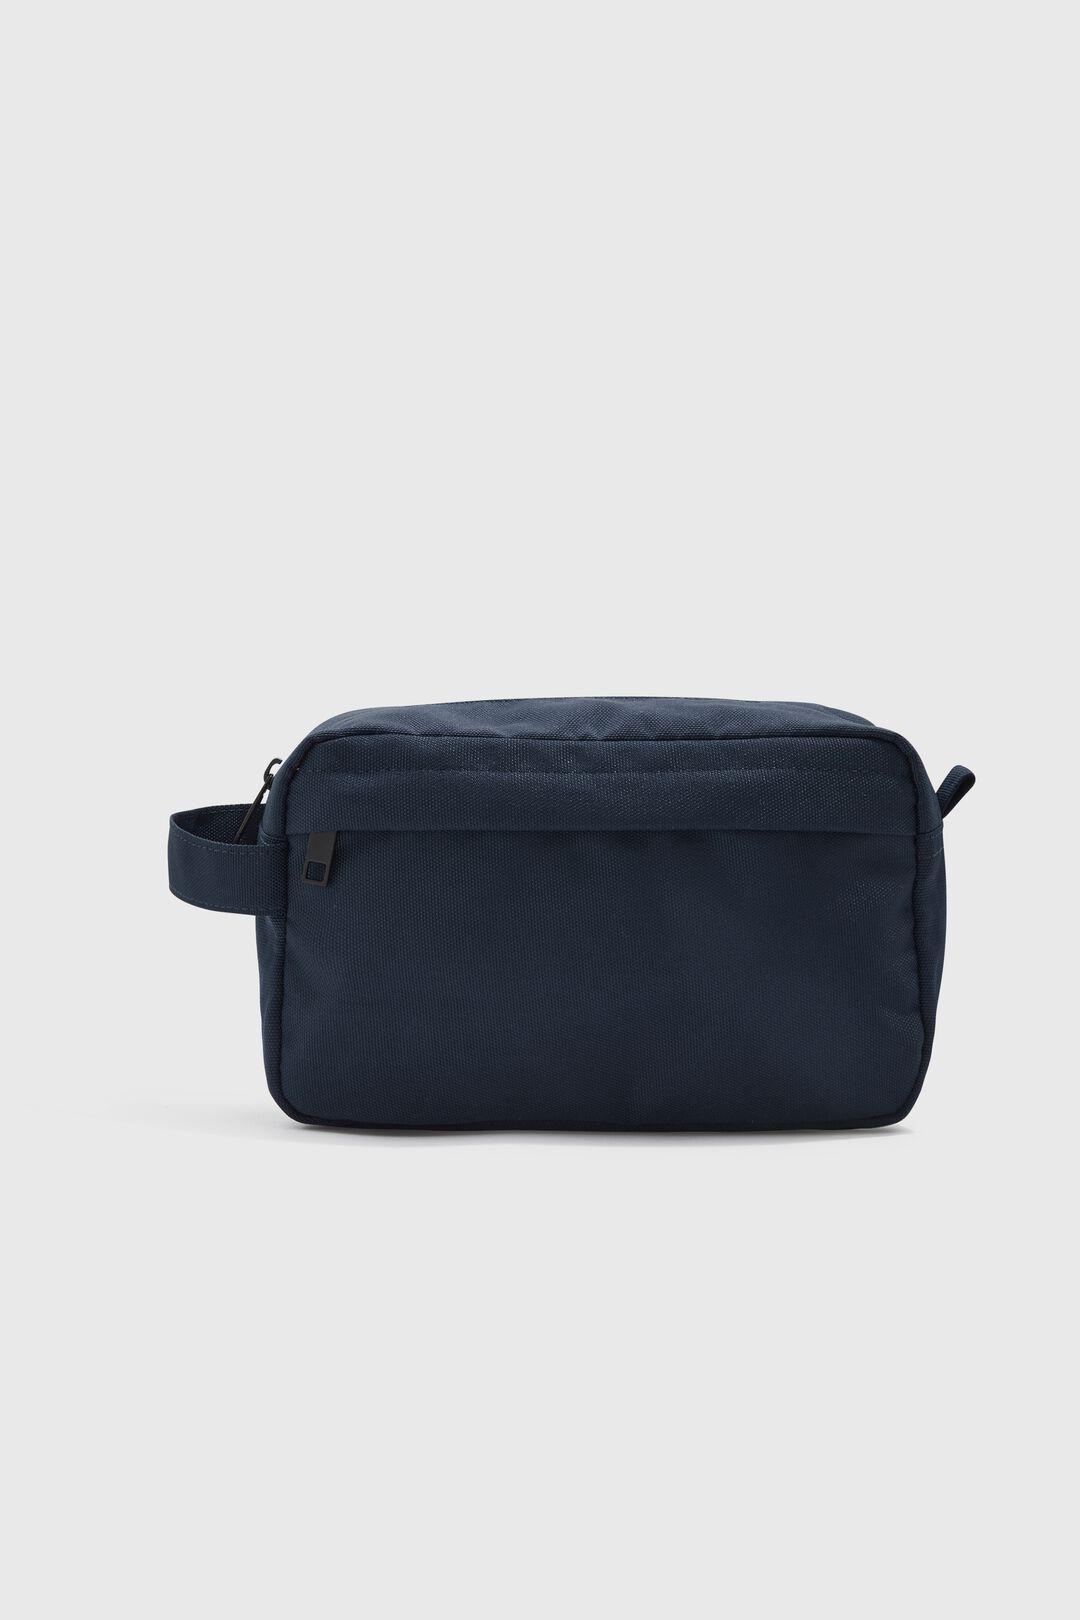 NYLON CANVAS WASH BAG  MARINE BLUE  hi-res